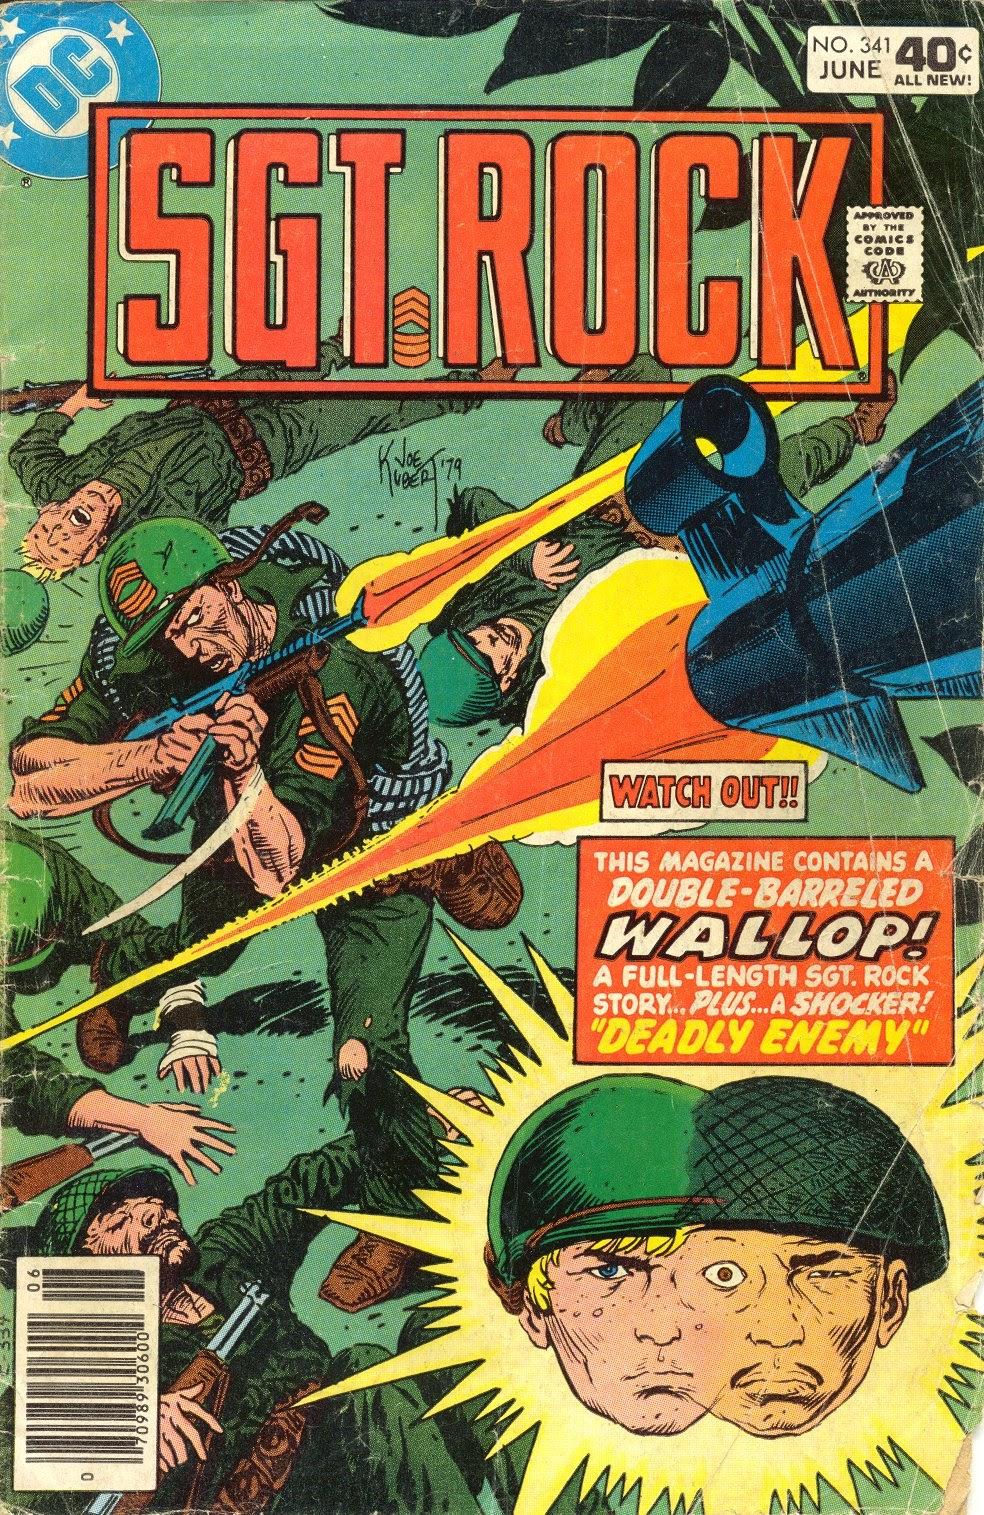 Read online Sgt. Rock comic -  Issue #341 - 1